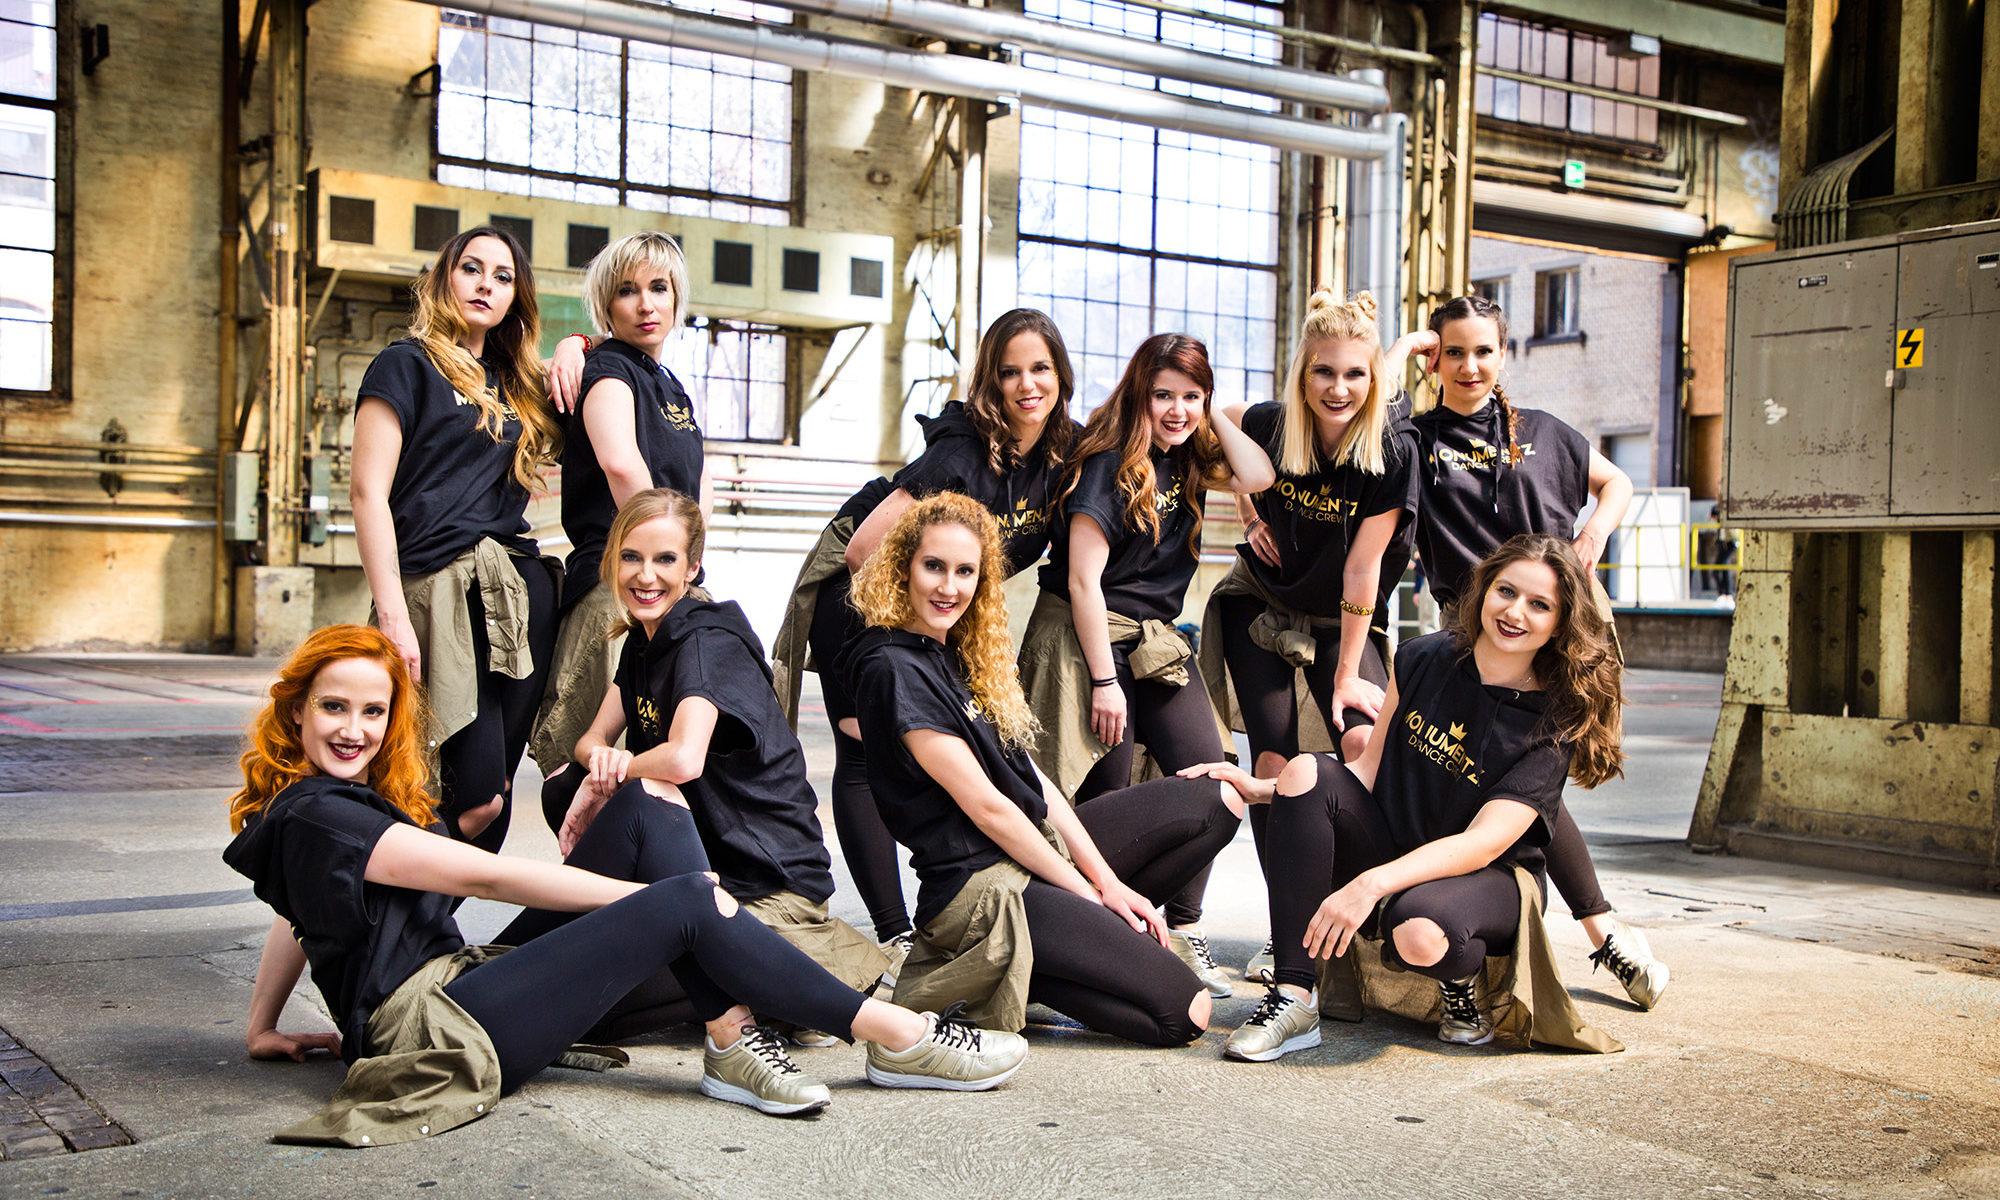 Tanzschule_Luzern_Hiphop_Showact